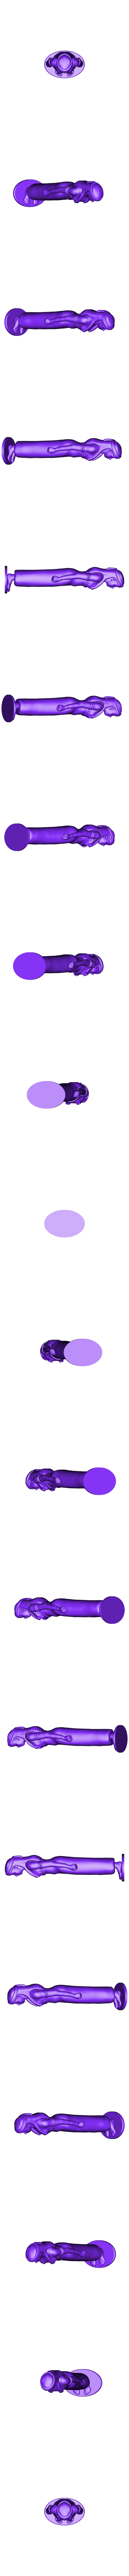 C4a28fba 3eb2 4c08 9a42 4a1d82385a3a